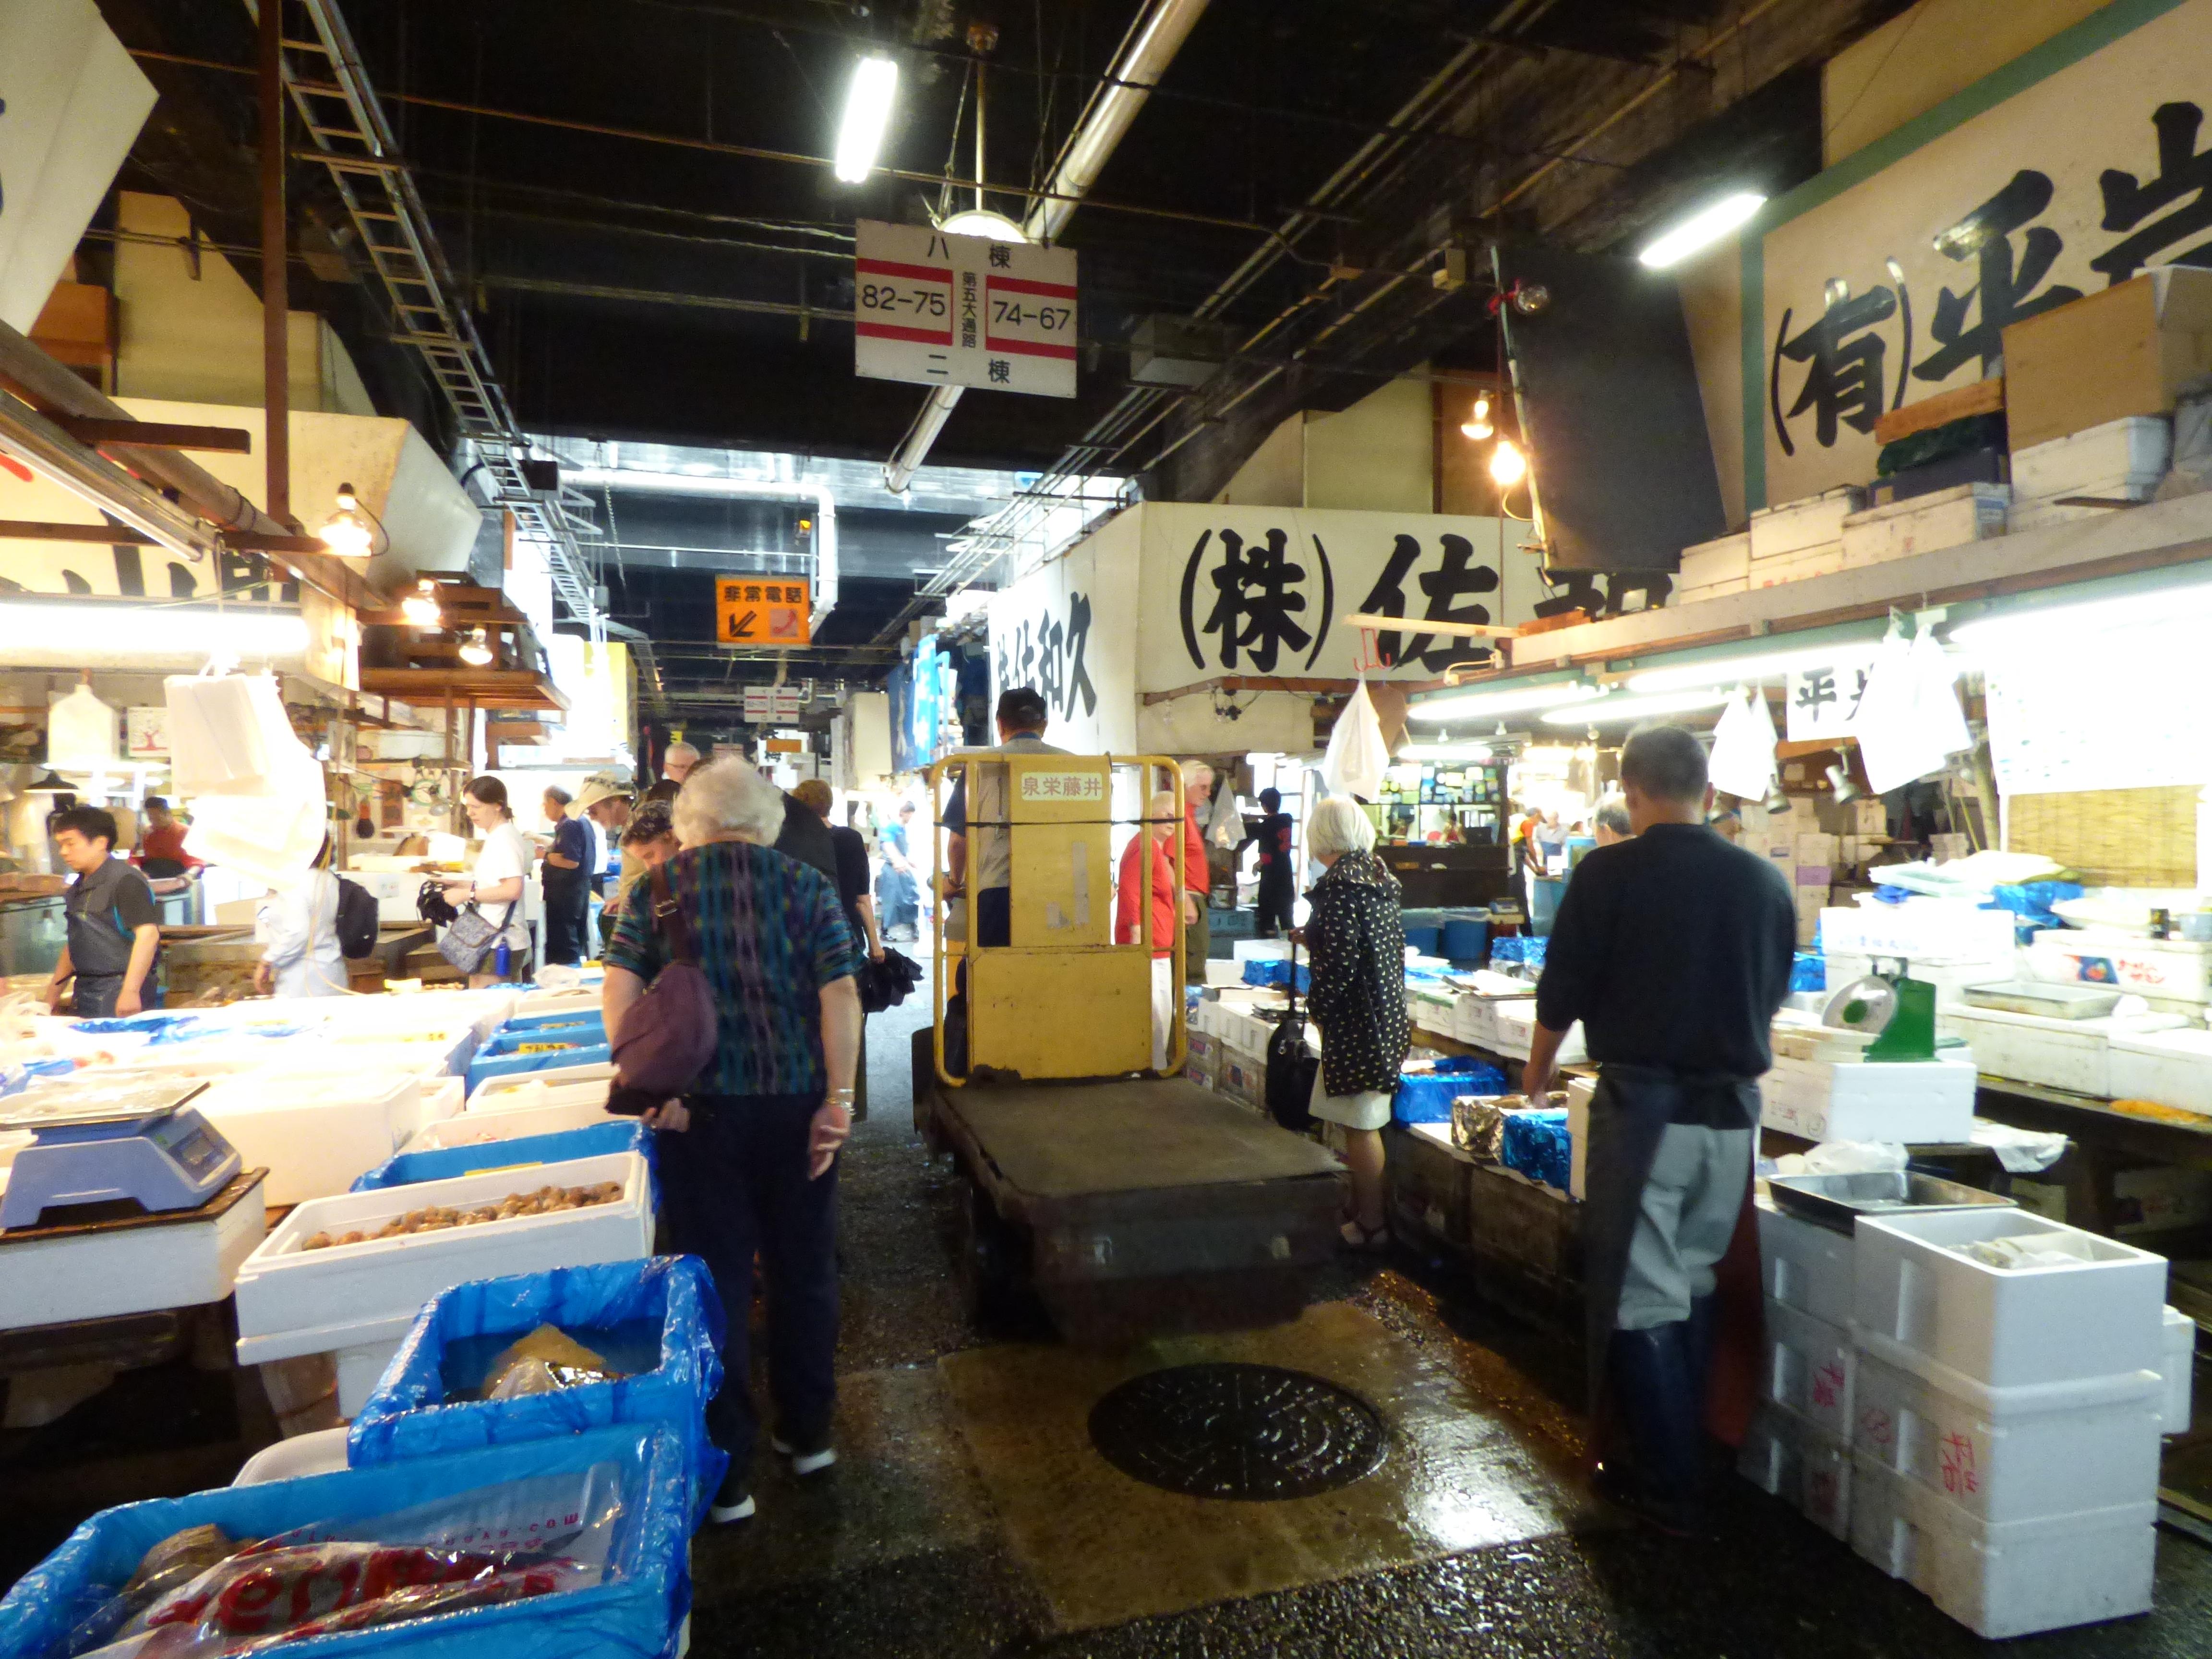 allée poissons tukiji marché couvert